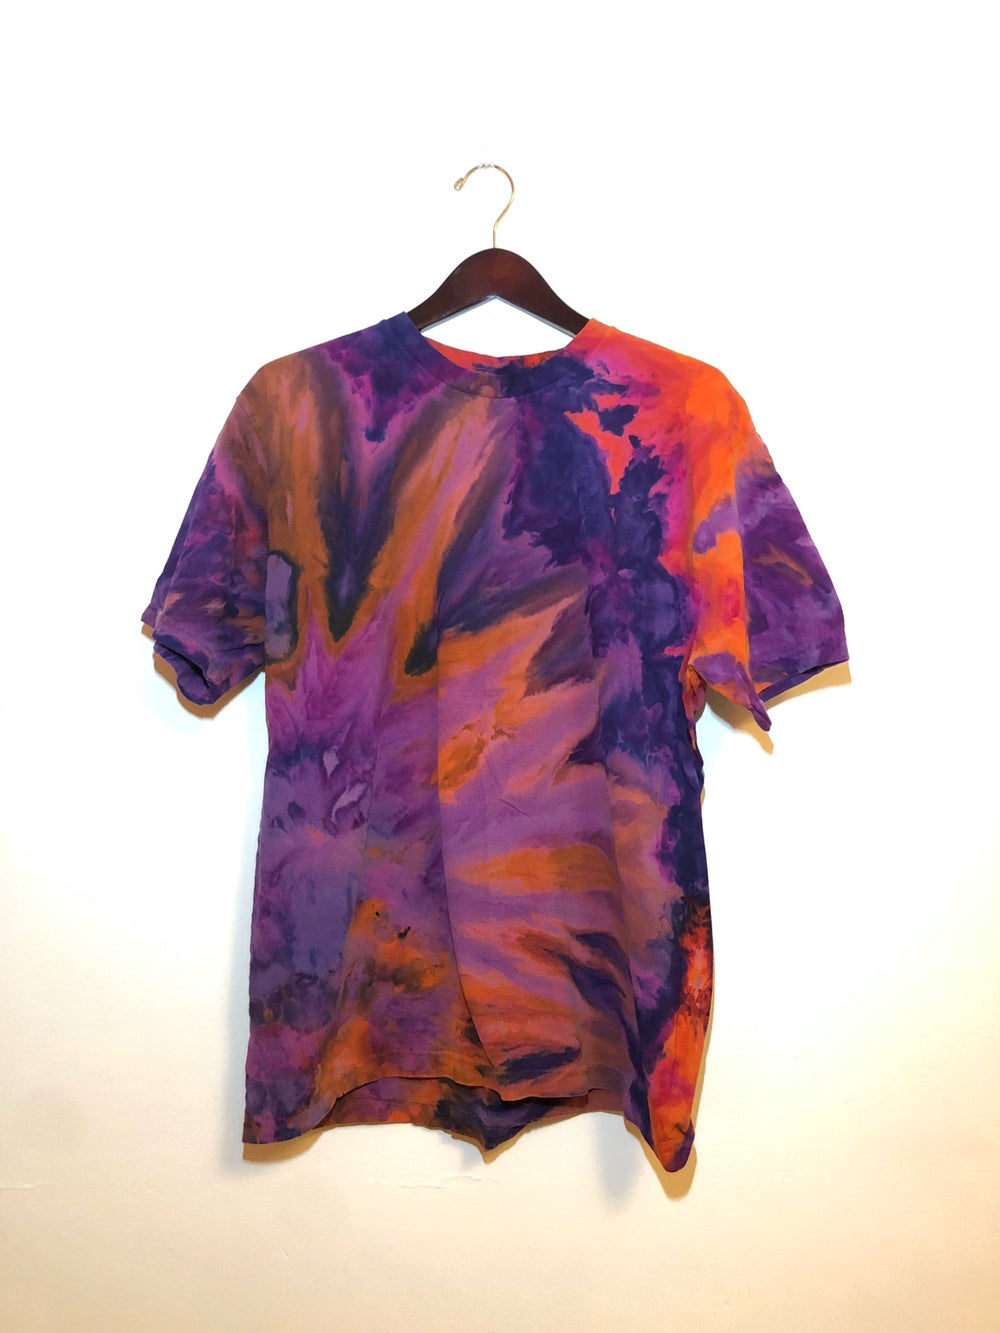 Shirt #29 - Medium